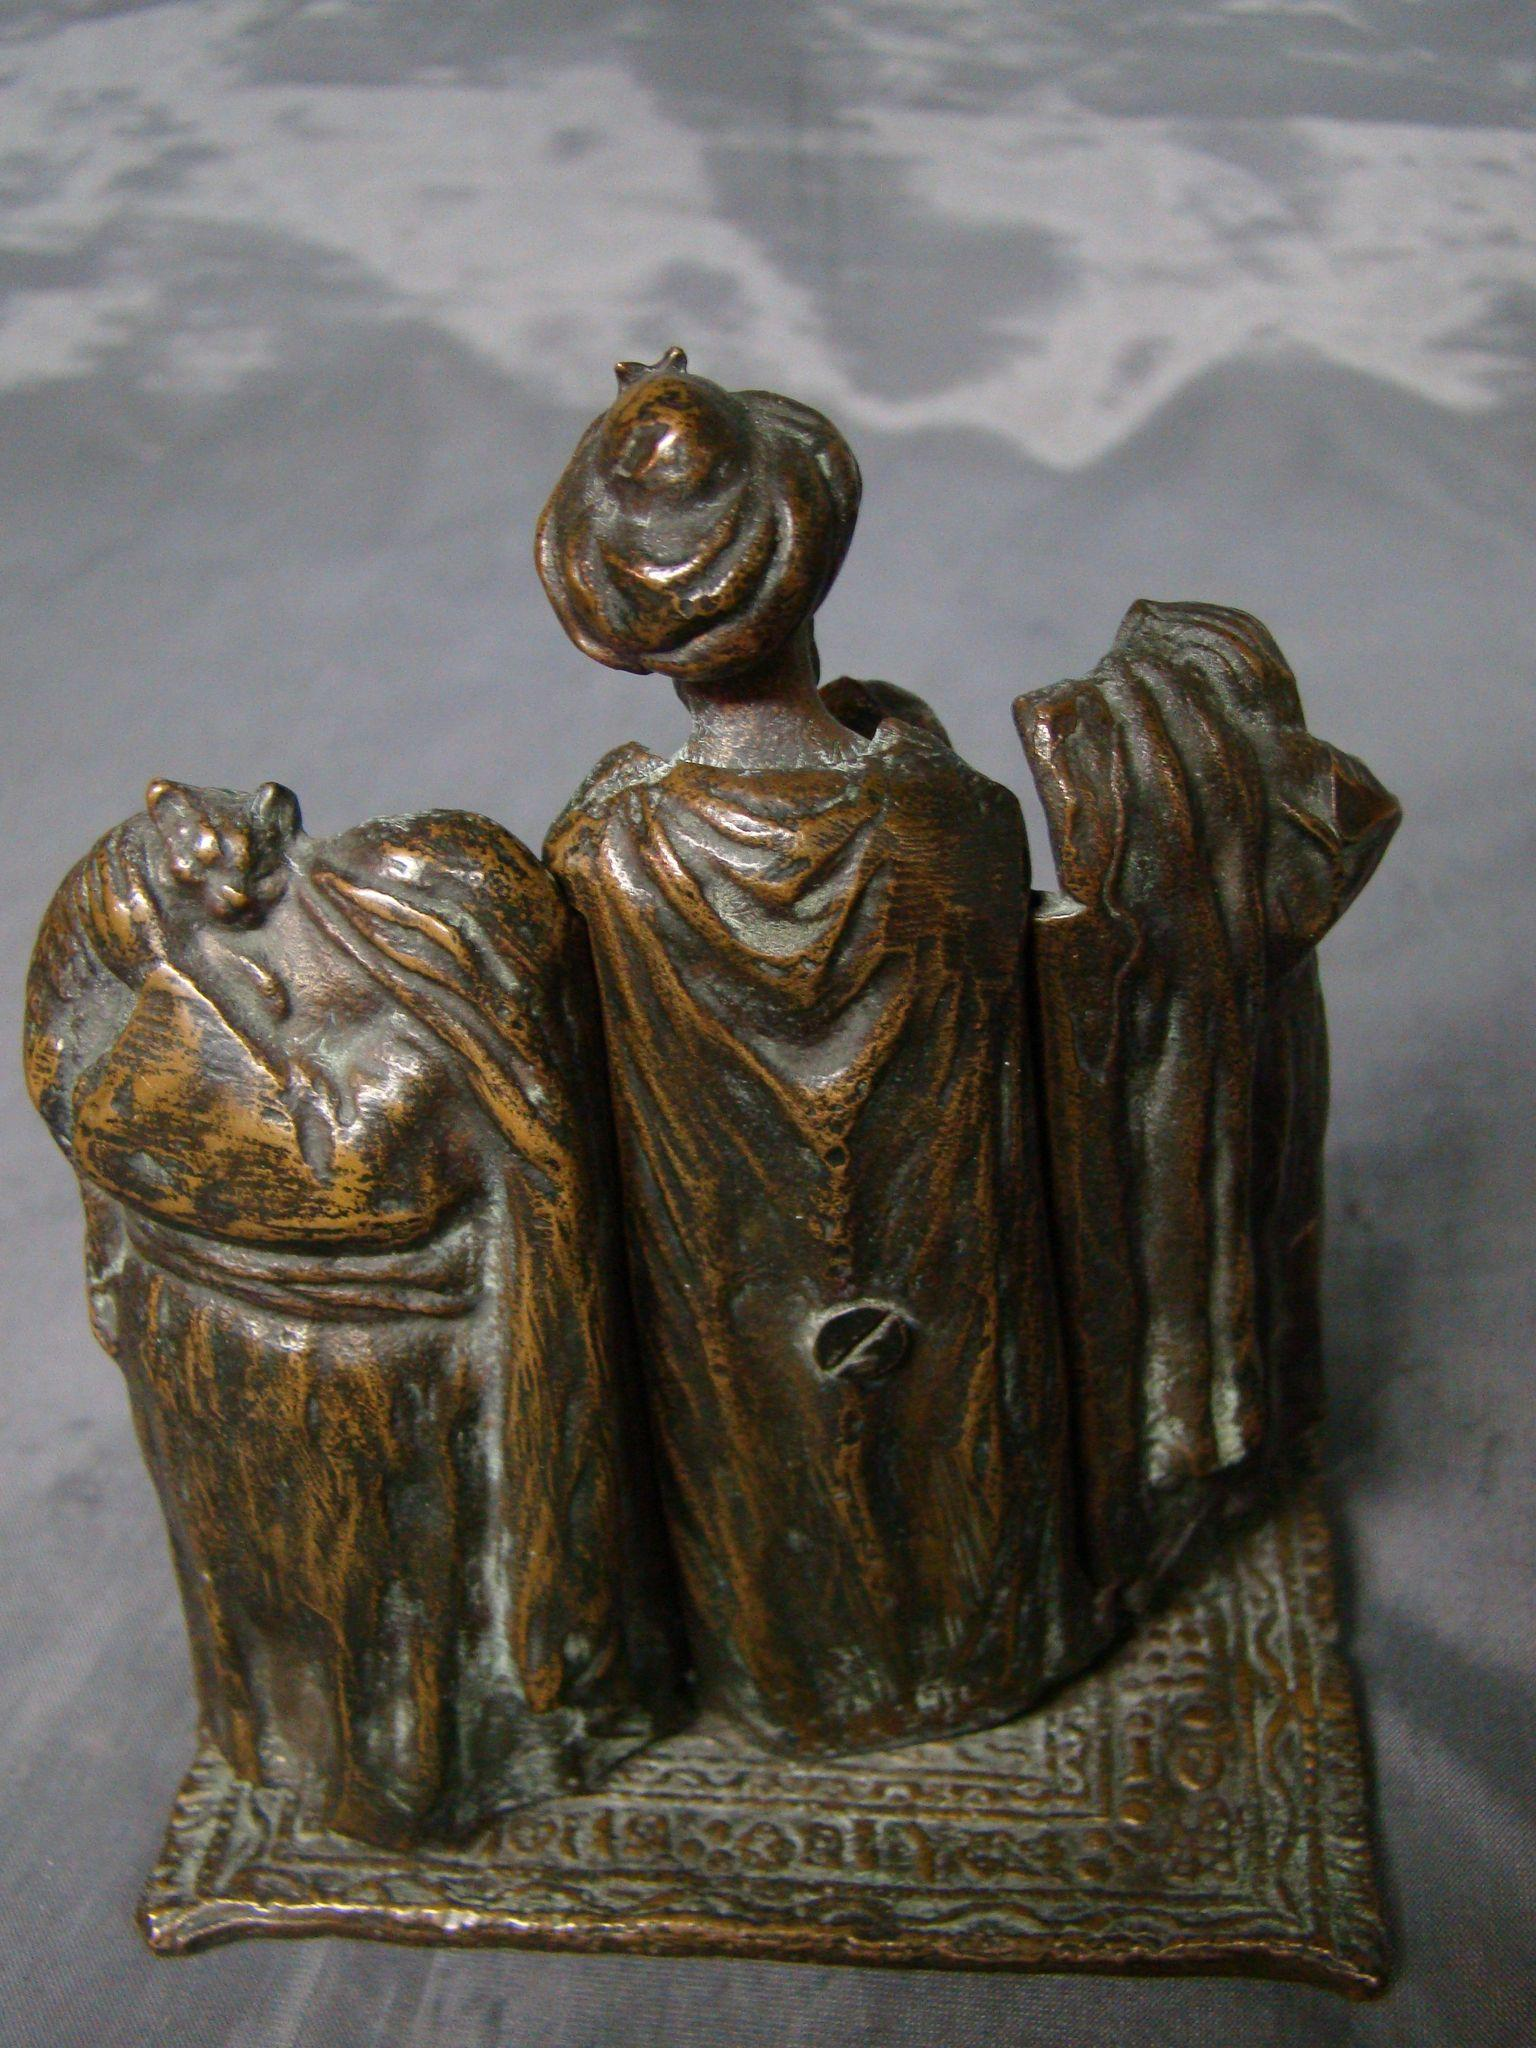 Austrian antique hidden erotic bronze sculpture Arabic man